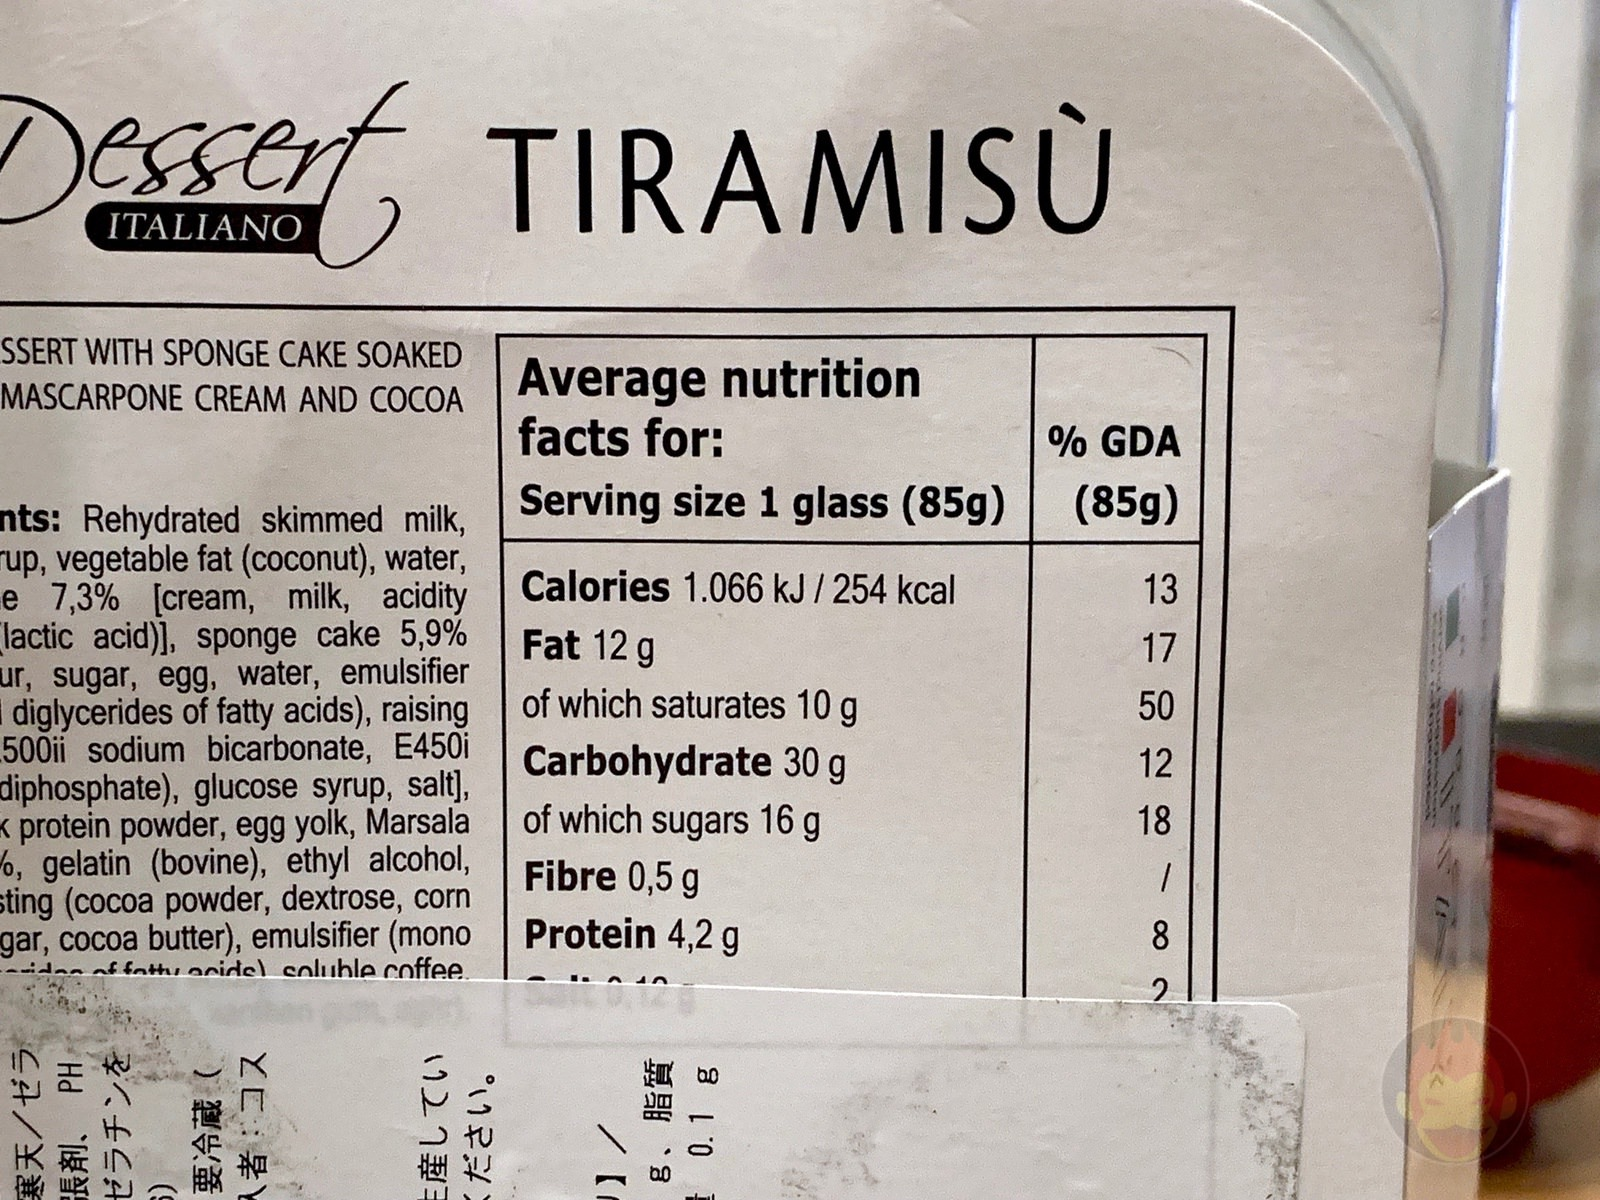 Delici-Tiramisu-Glass-Cup-Costco-04.jpg